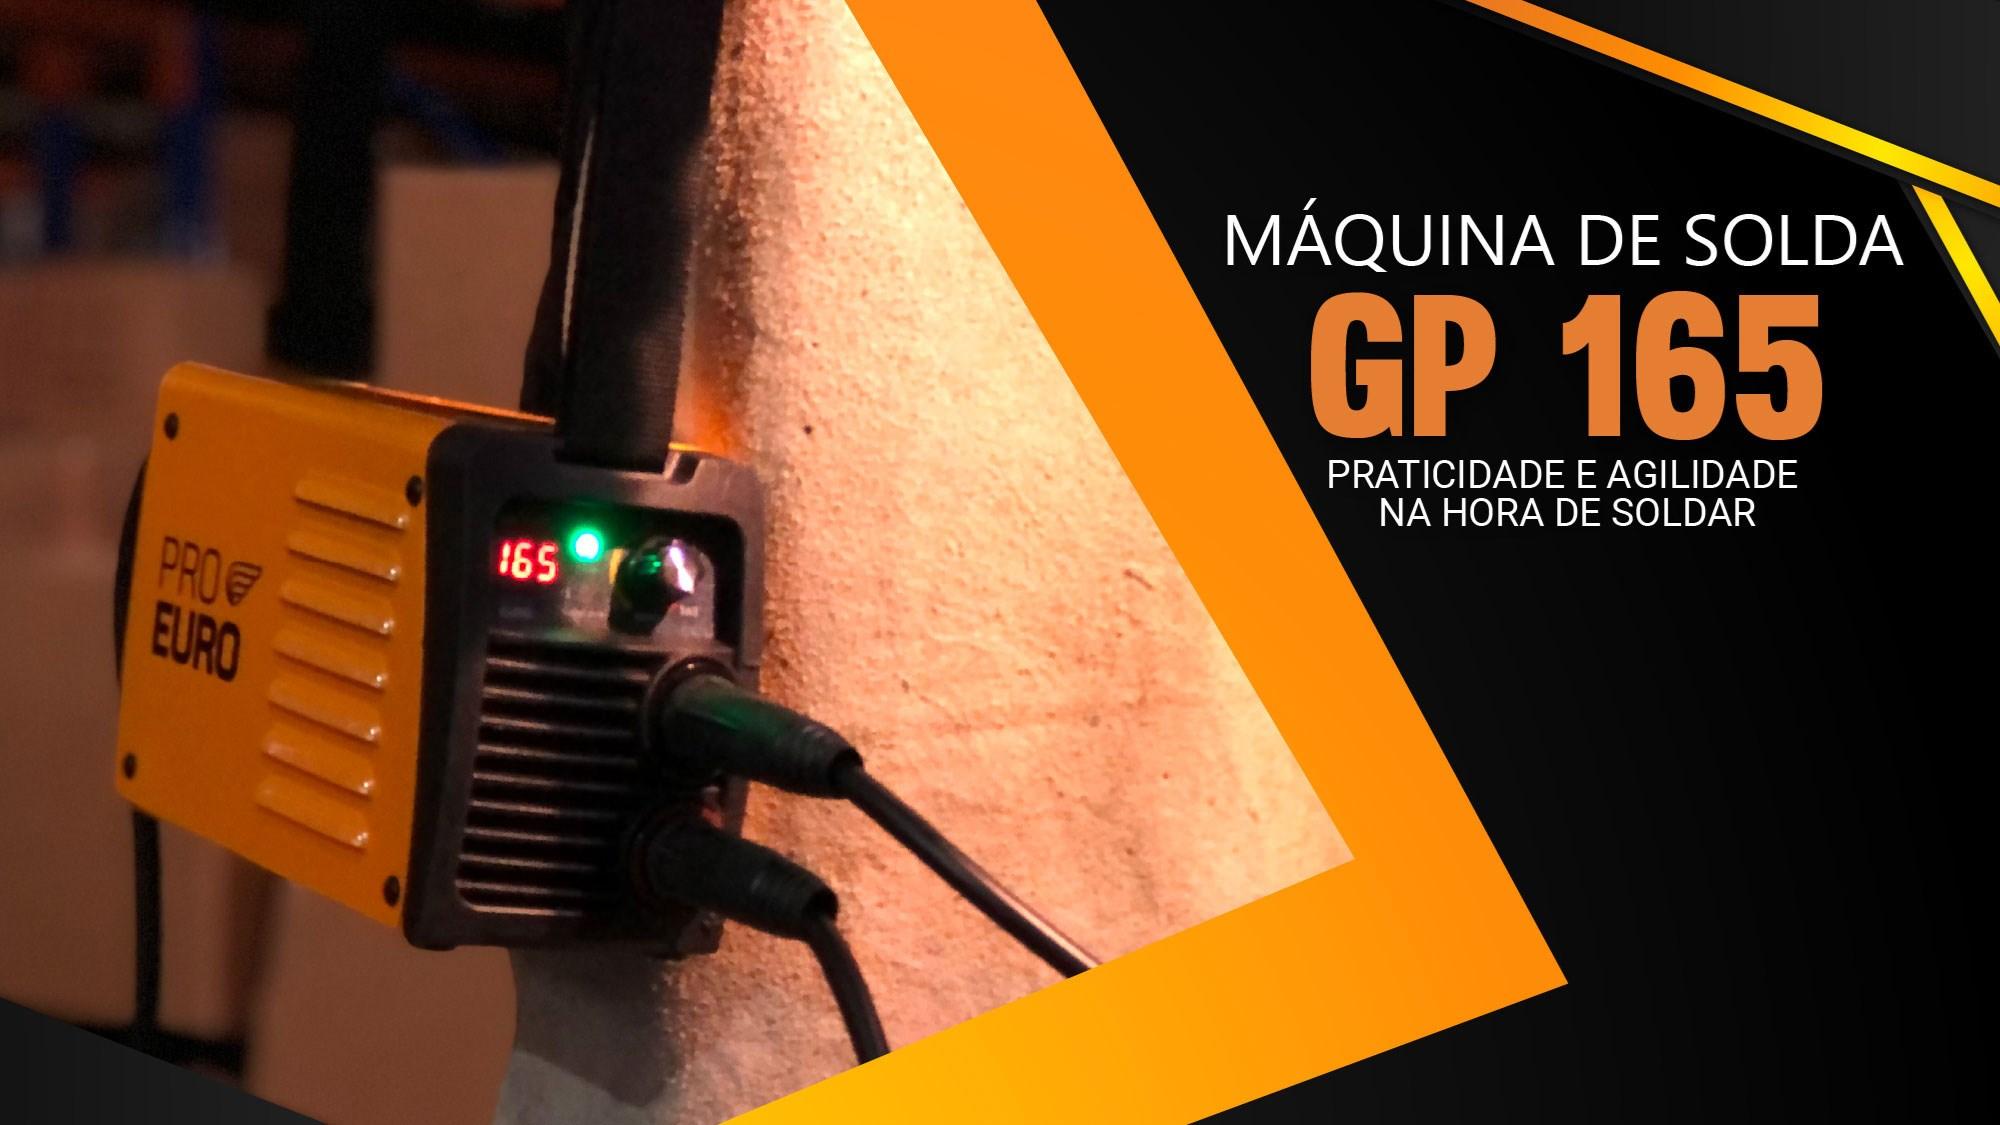 GP 165 - Pró Euro